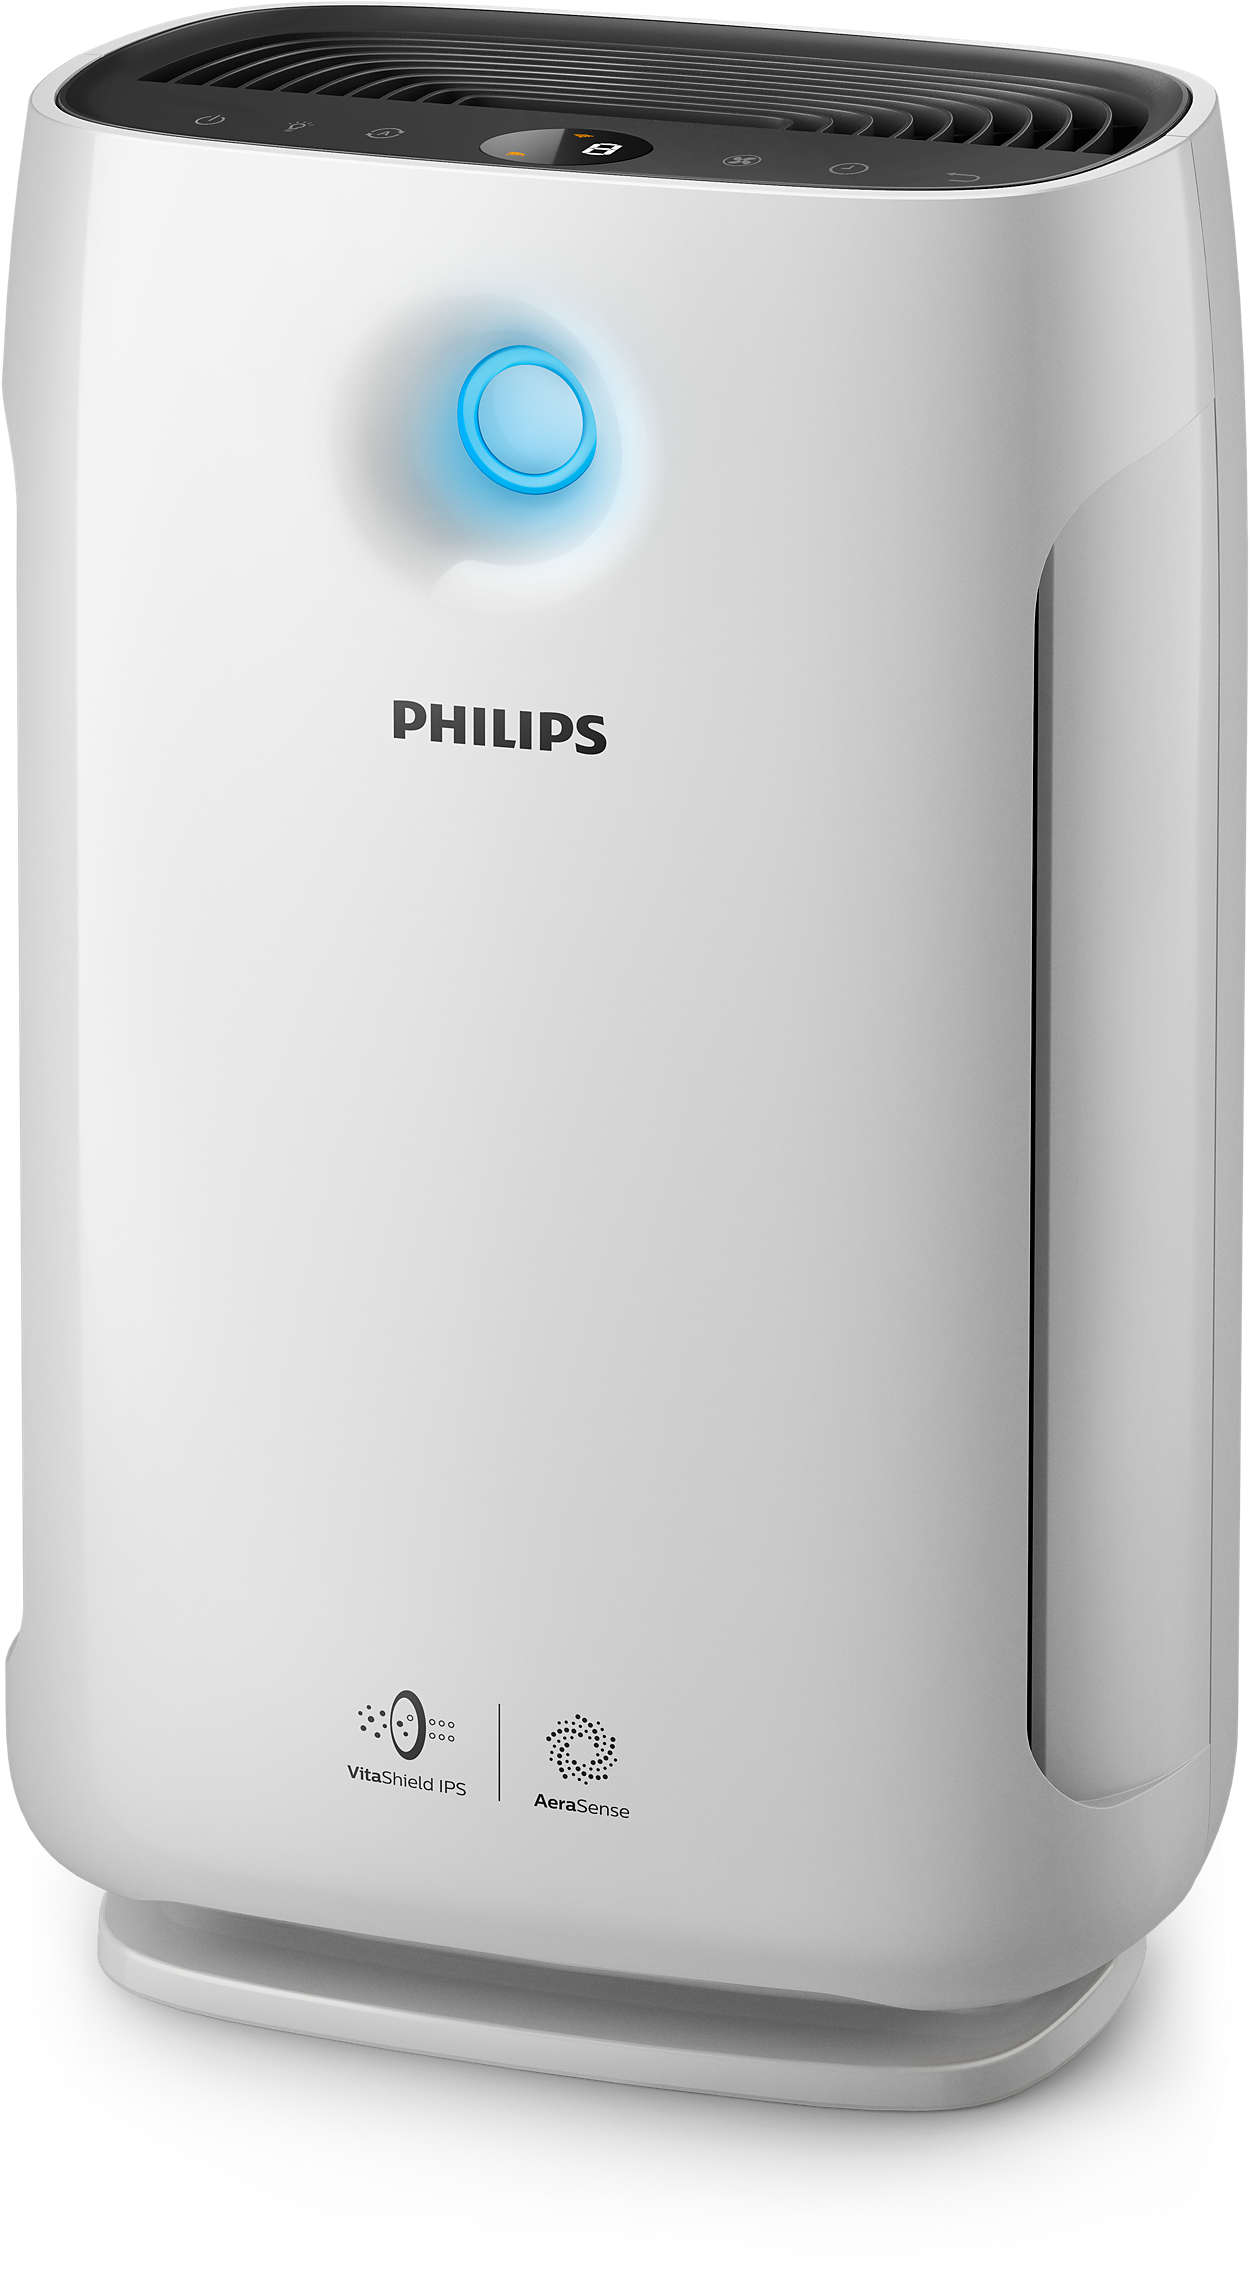 Purifies the air in less than 9 mins (1)